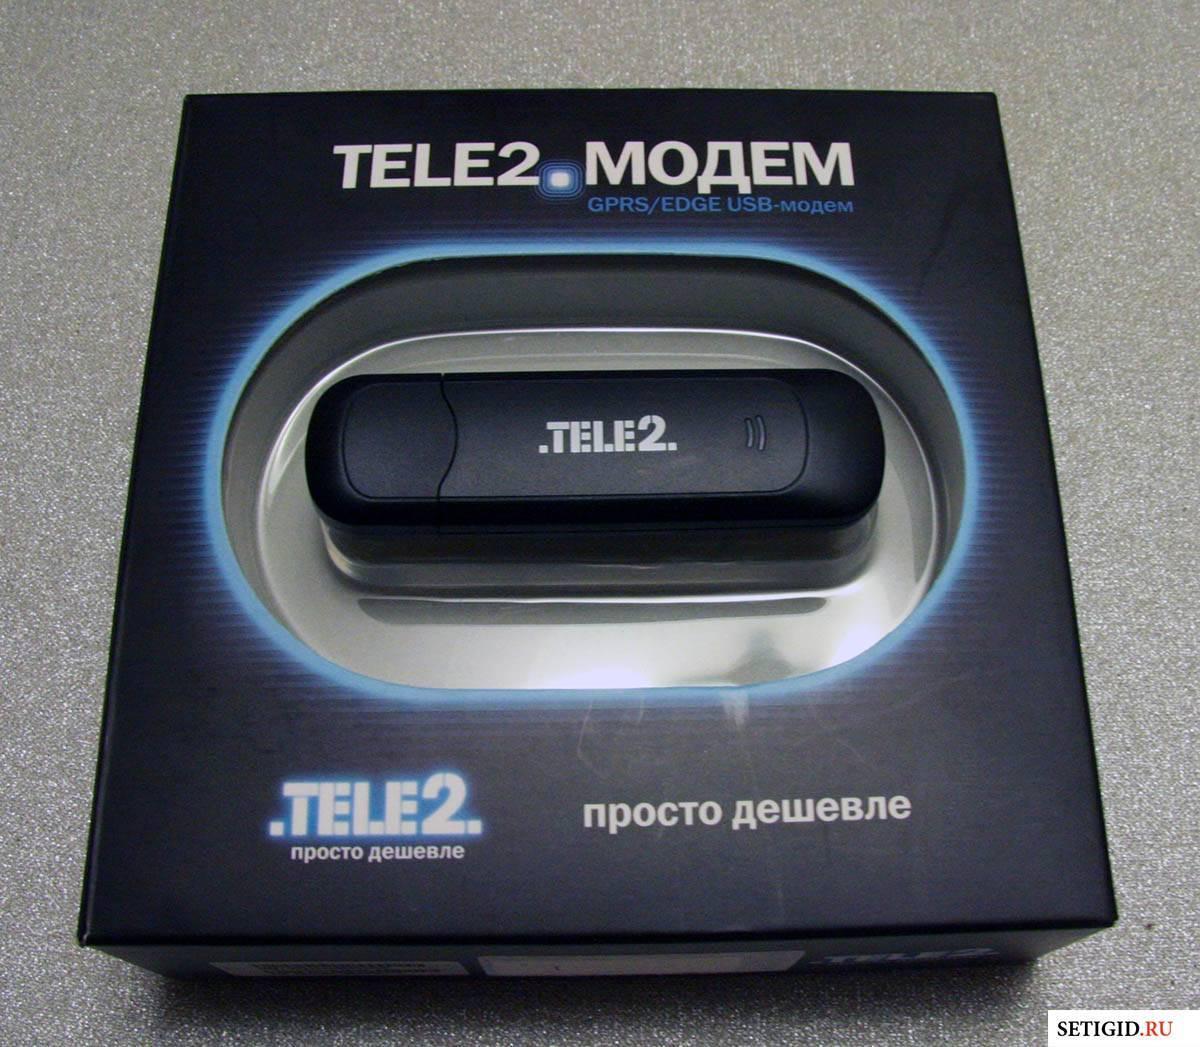 Modem-tele2.jpg